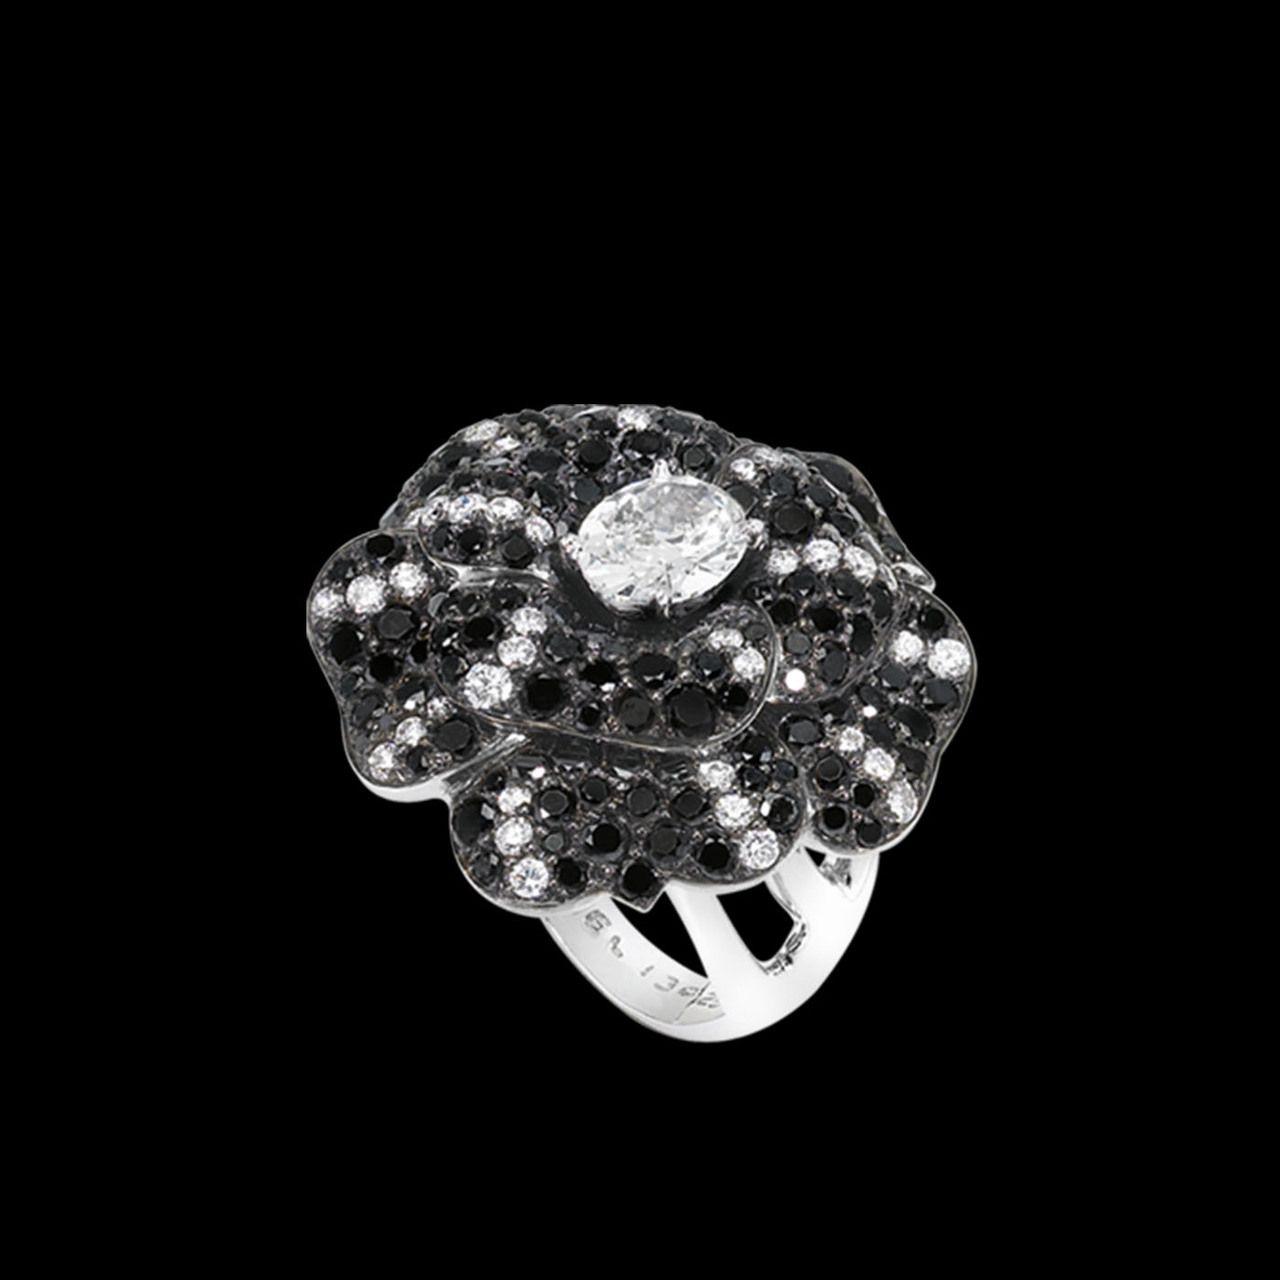 CHANEL - Jewelry - RINGS CAMÉLIA